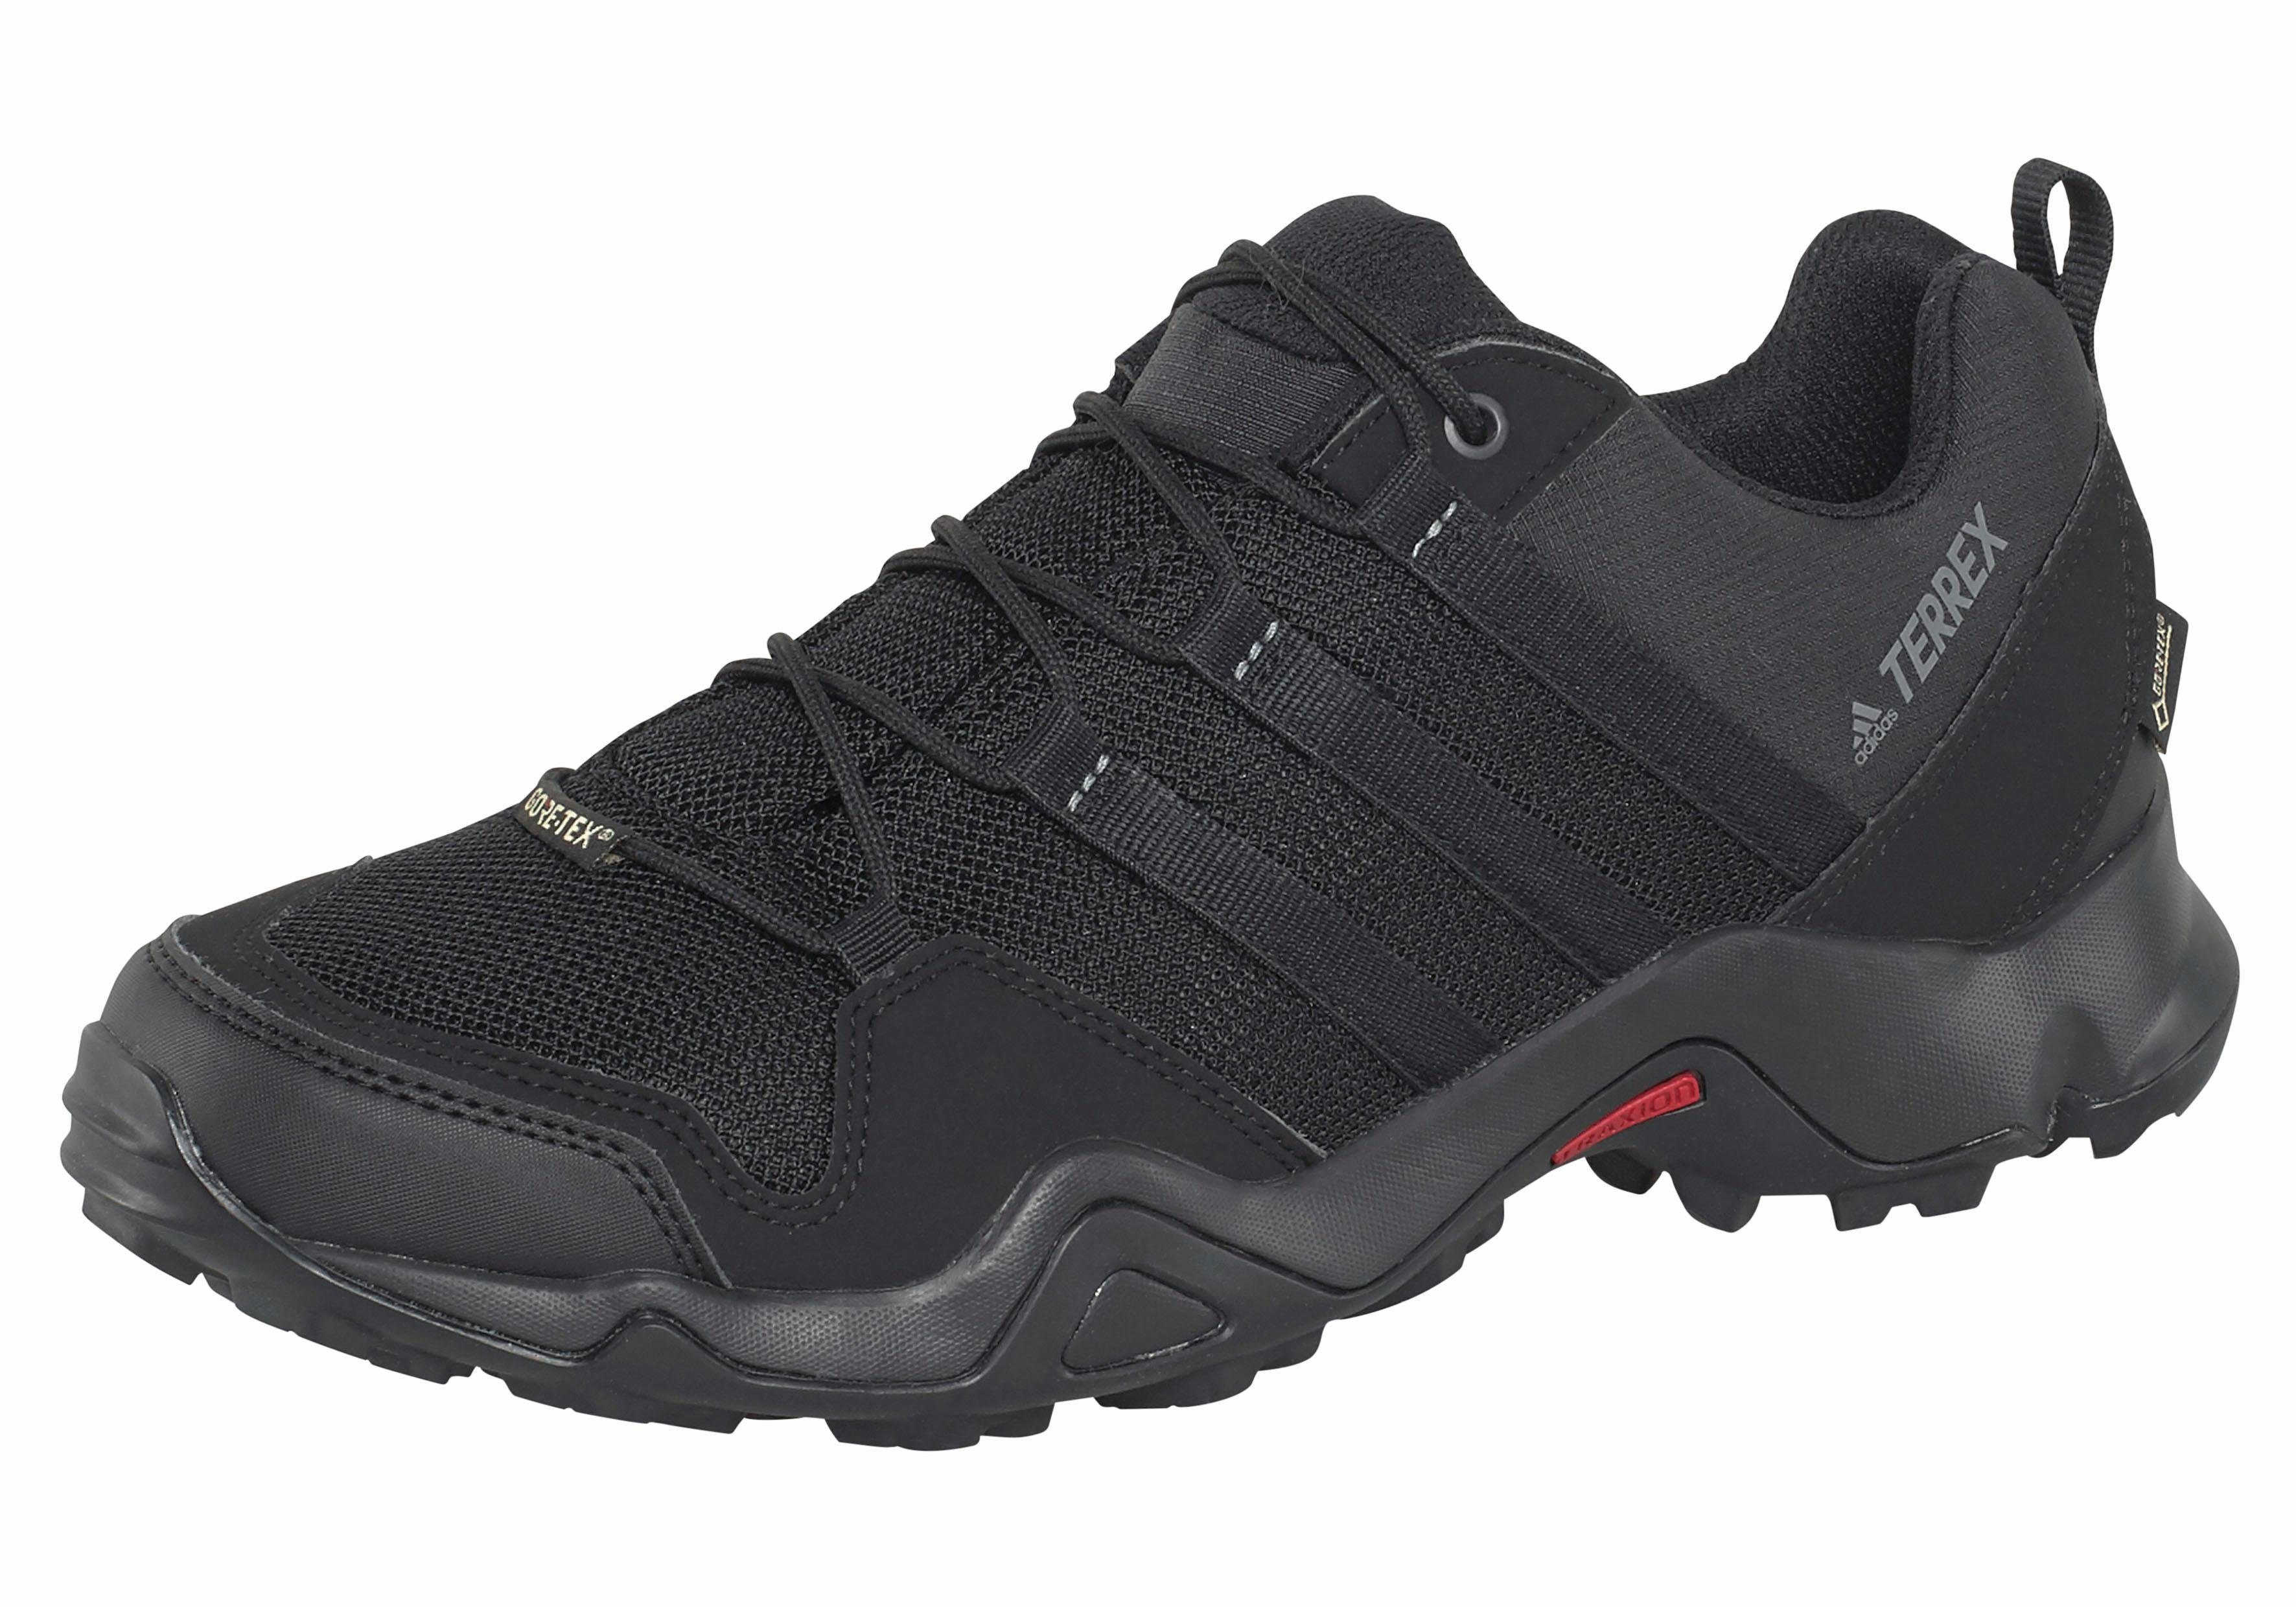 Chaussures Noir Adidas Performance En Taille 46 Hommes 2q5Eg3YiB